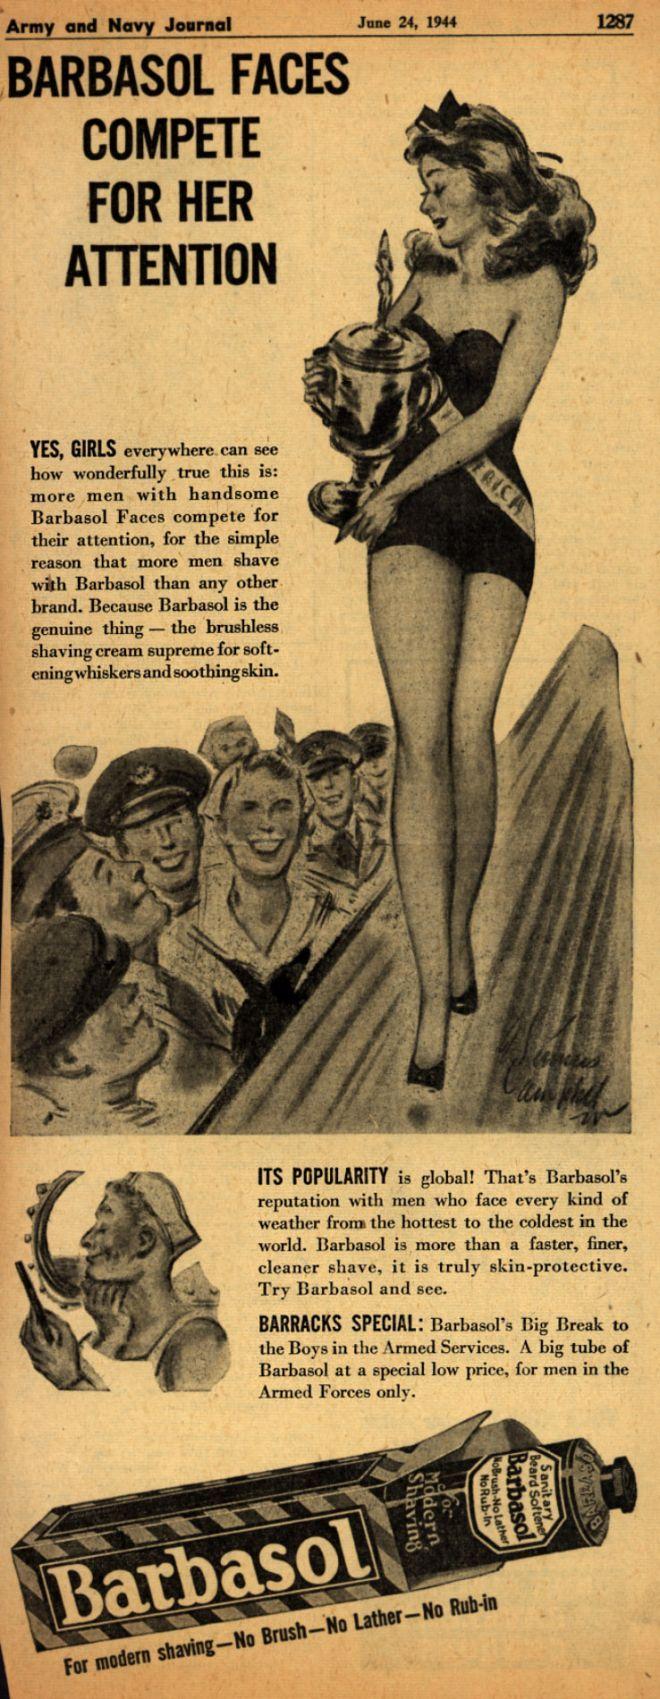 Vintage bathroom ads - Barbasol Barbasol Faces Compete For Her Attention 1944